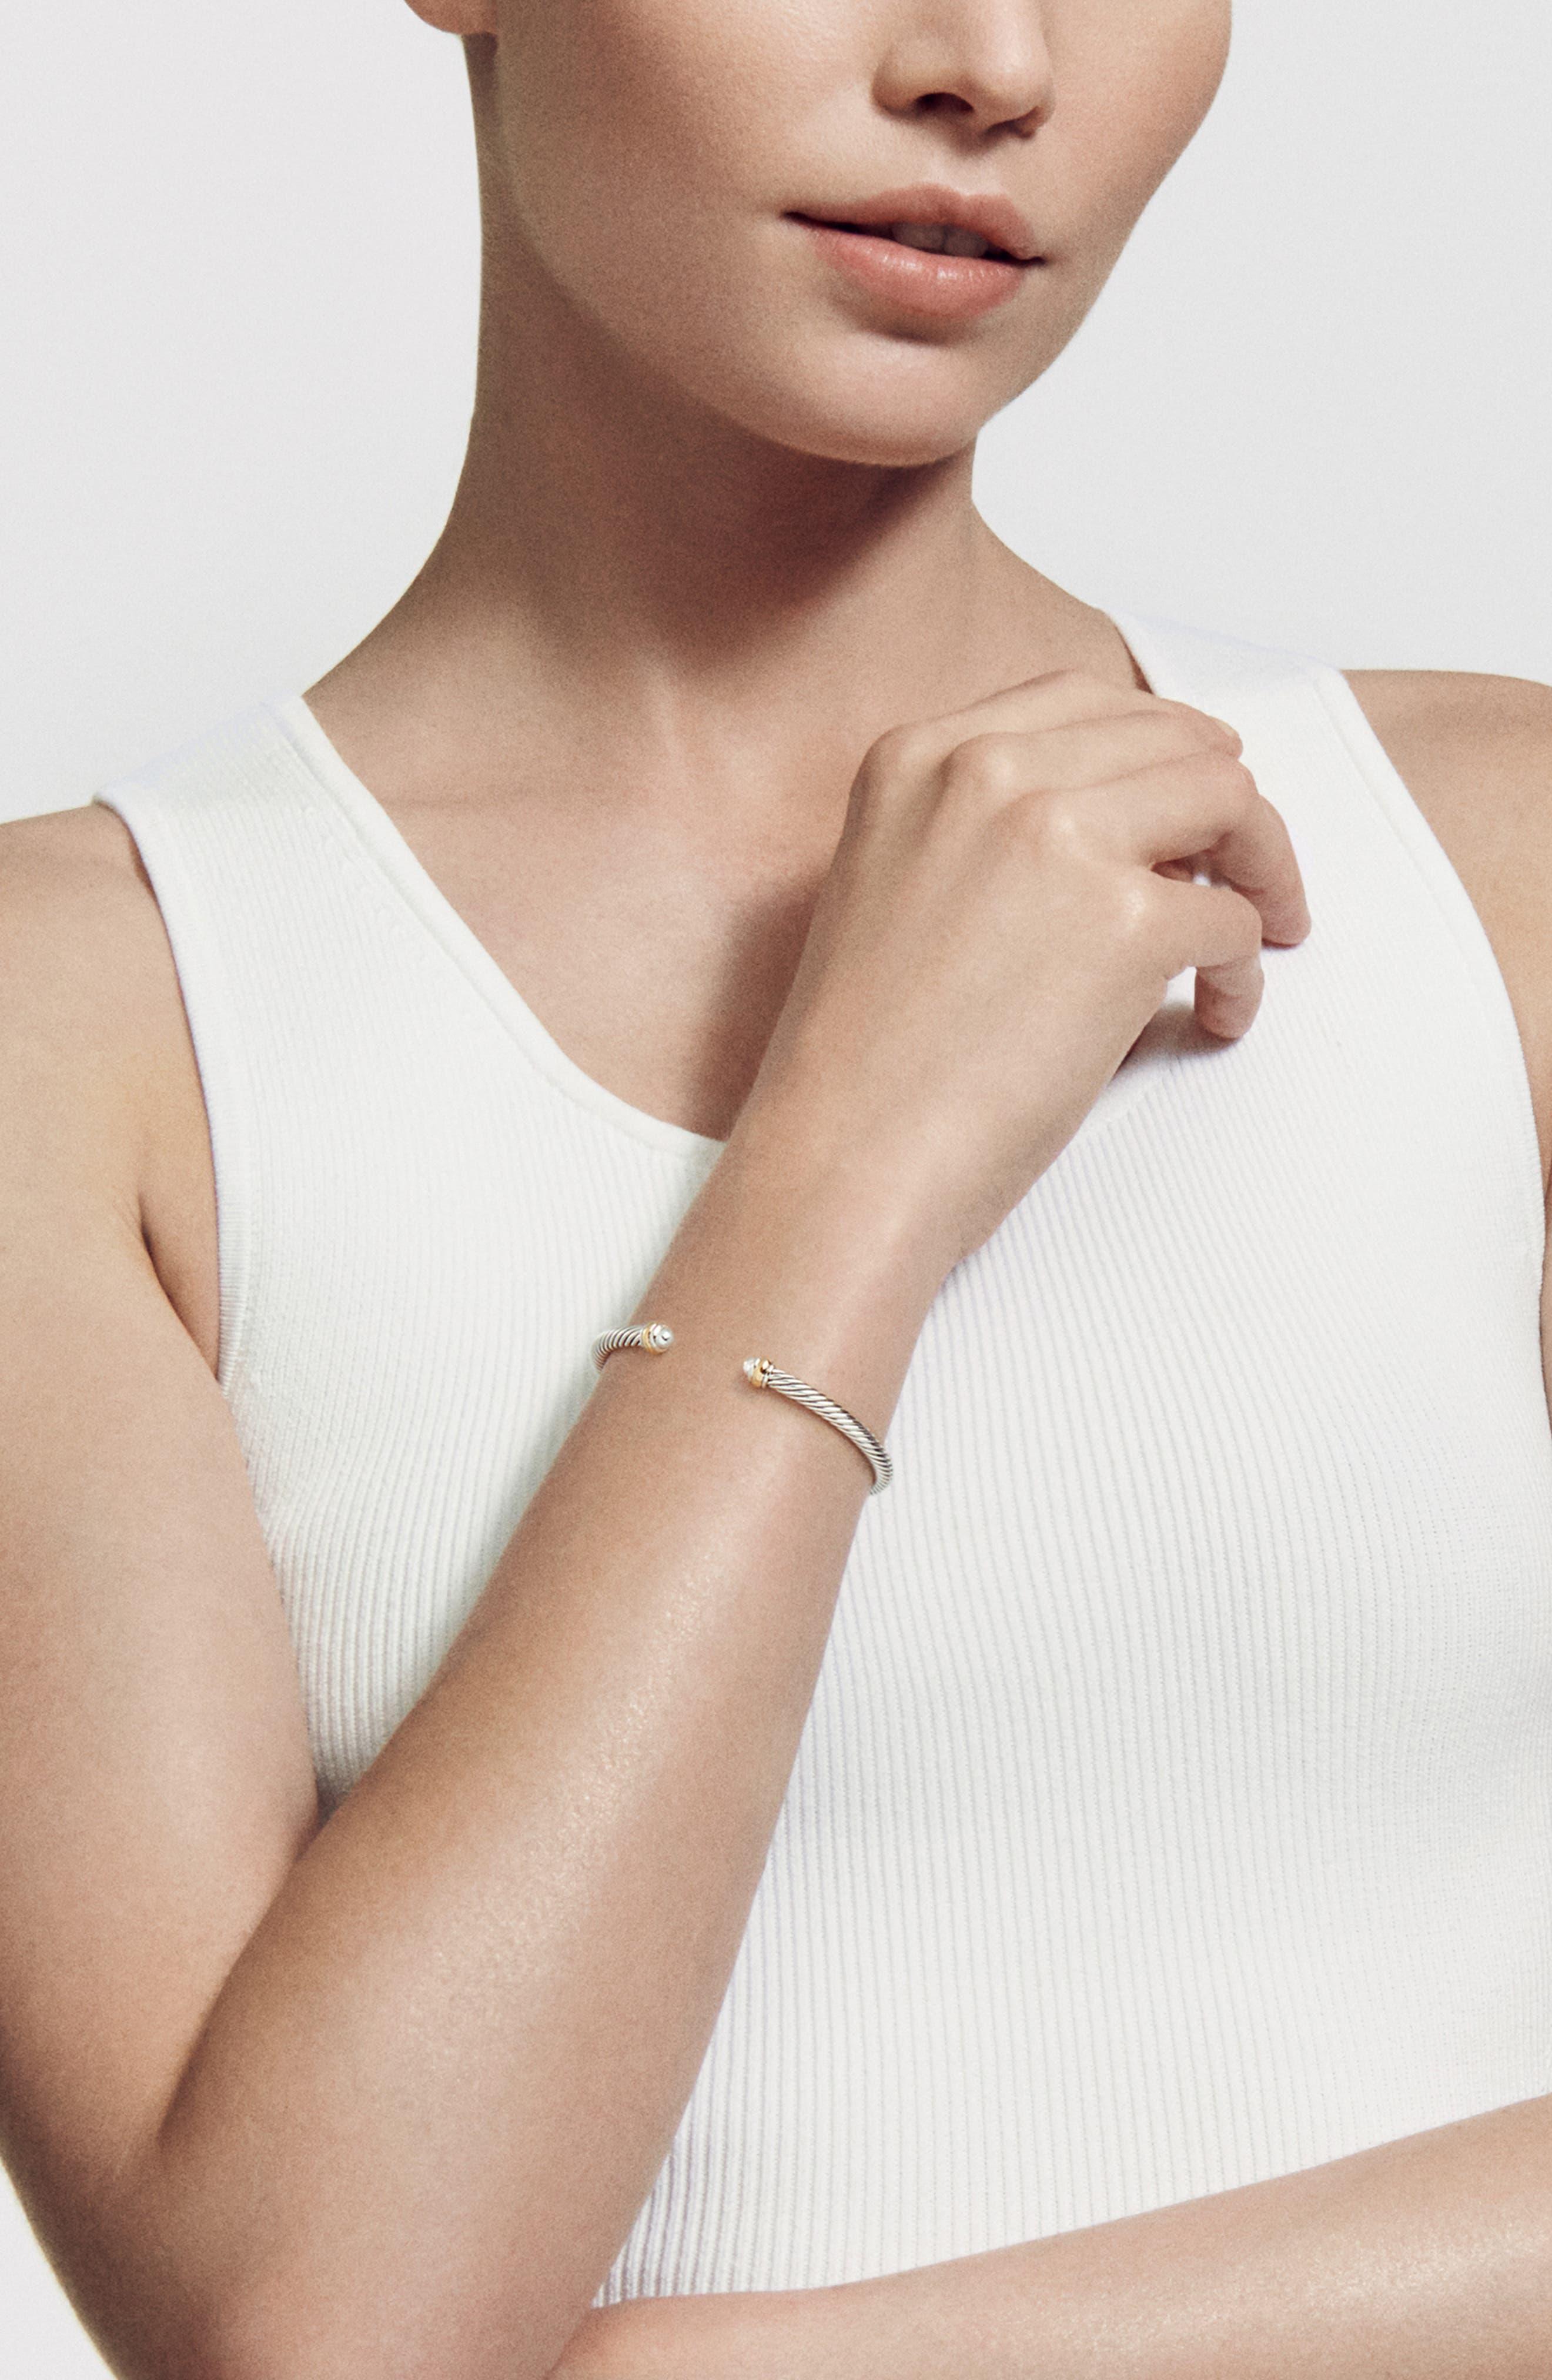 DAVID YURMAN, Cable Classics Bracelet with 18K Gold, 4mm, Alternate thumbnail 2, color, TWO TONE